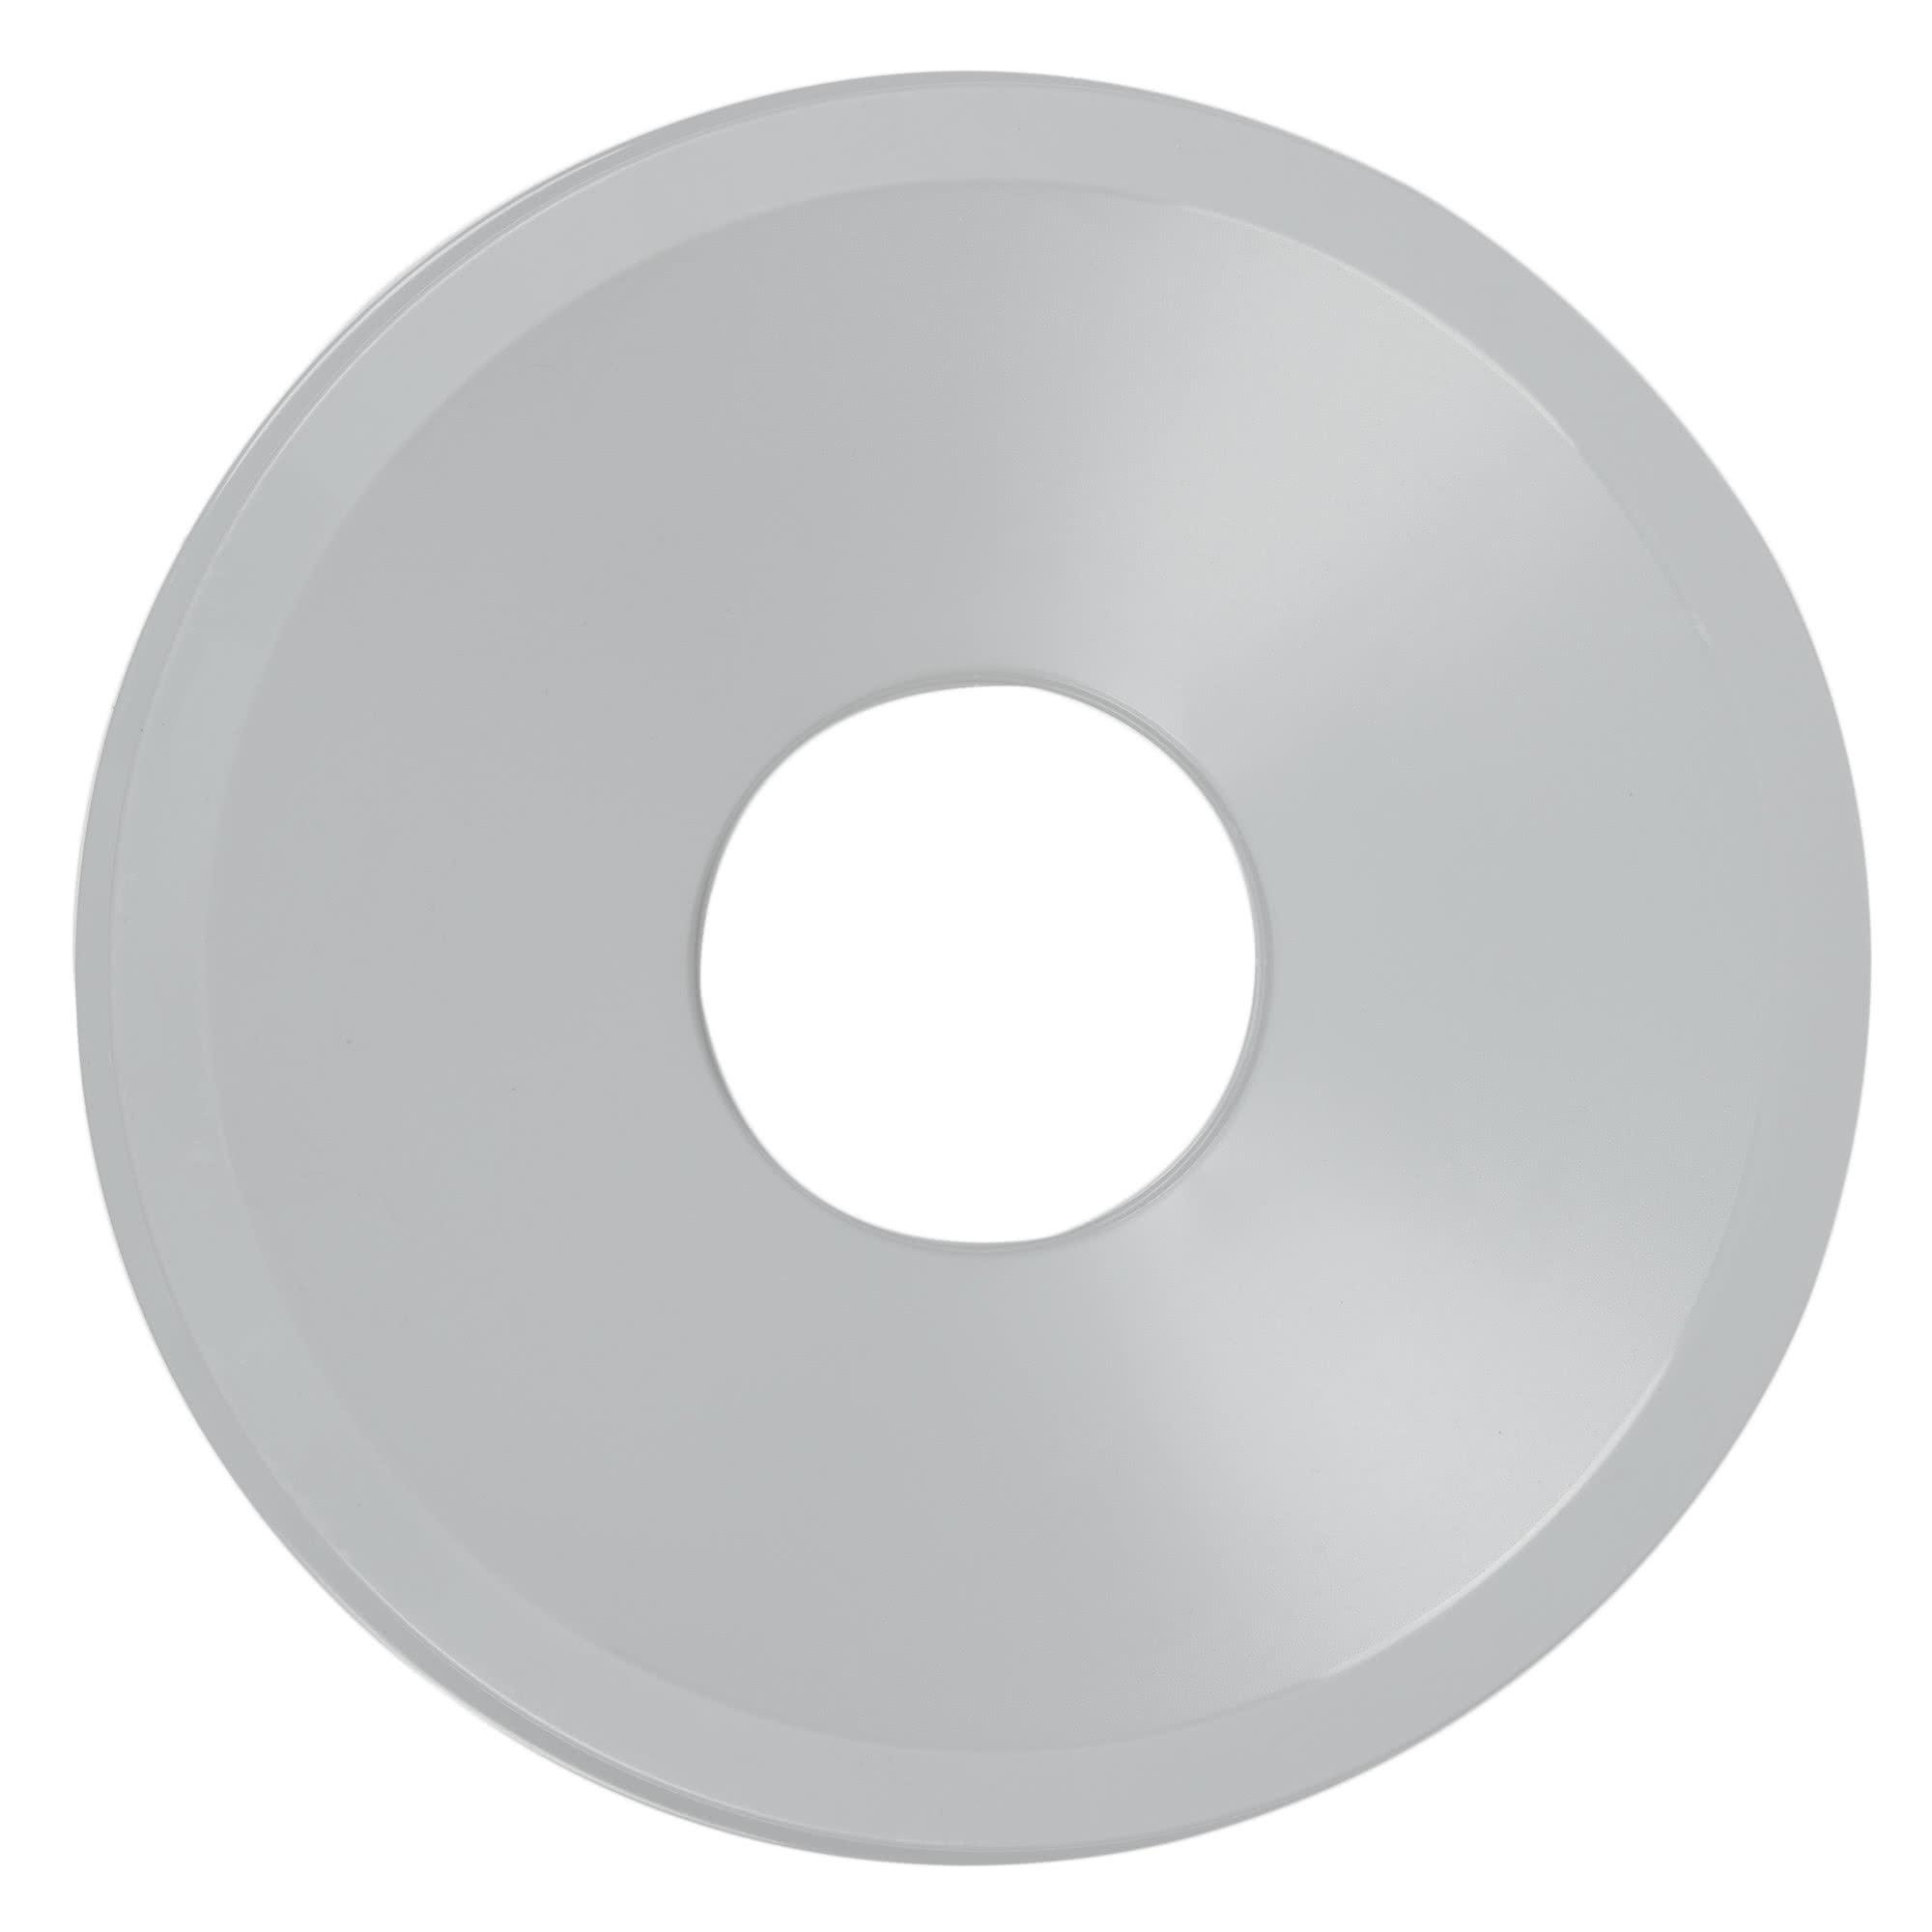 Rubbermaid FG354800GRAY tapa untouchable color gris round funnel top, aplican contenedores FG294700 y FG354600 2